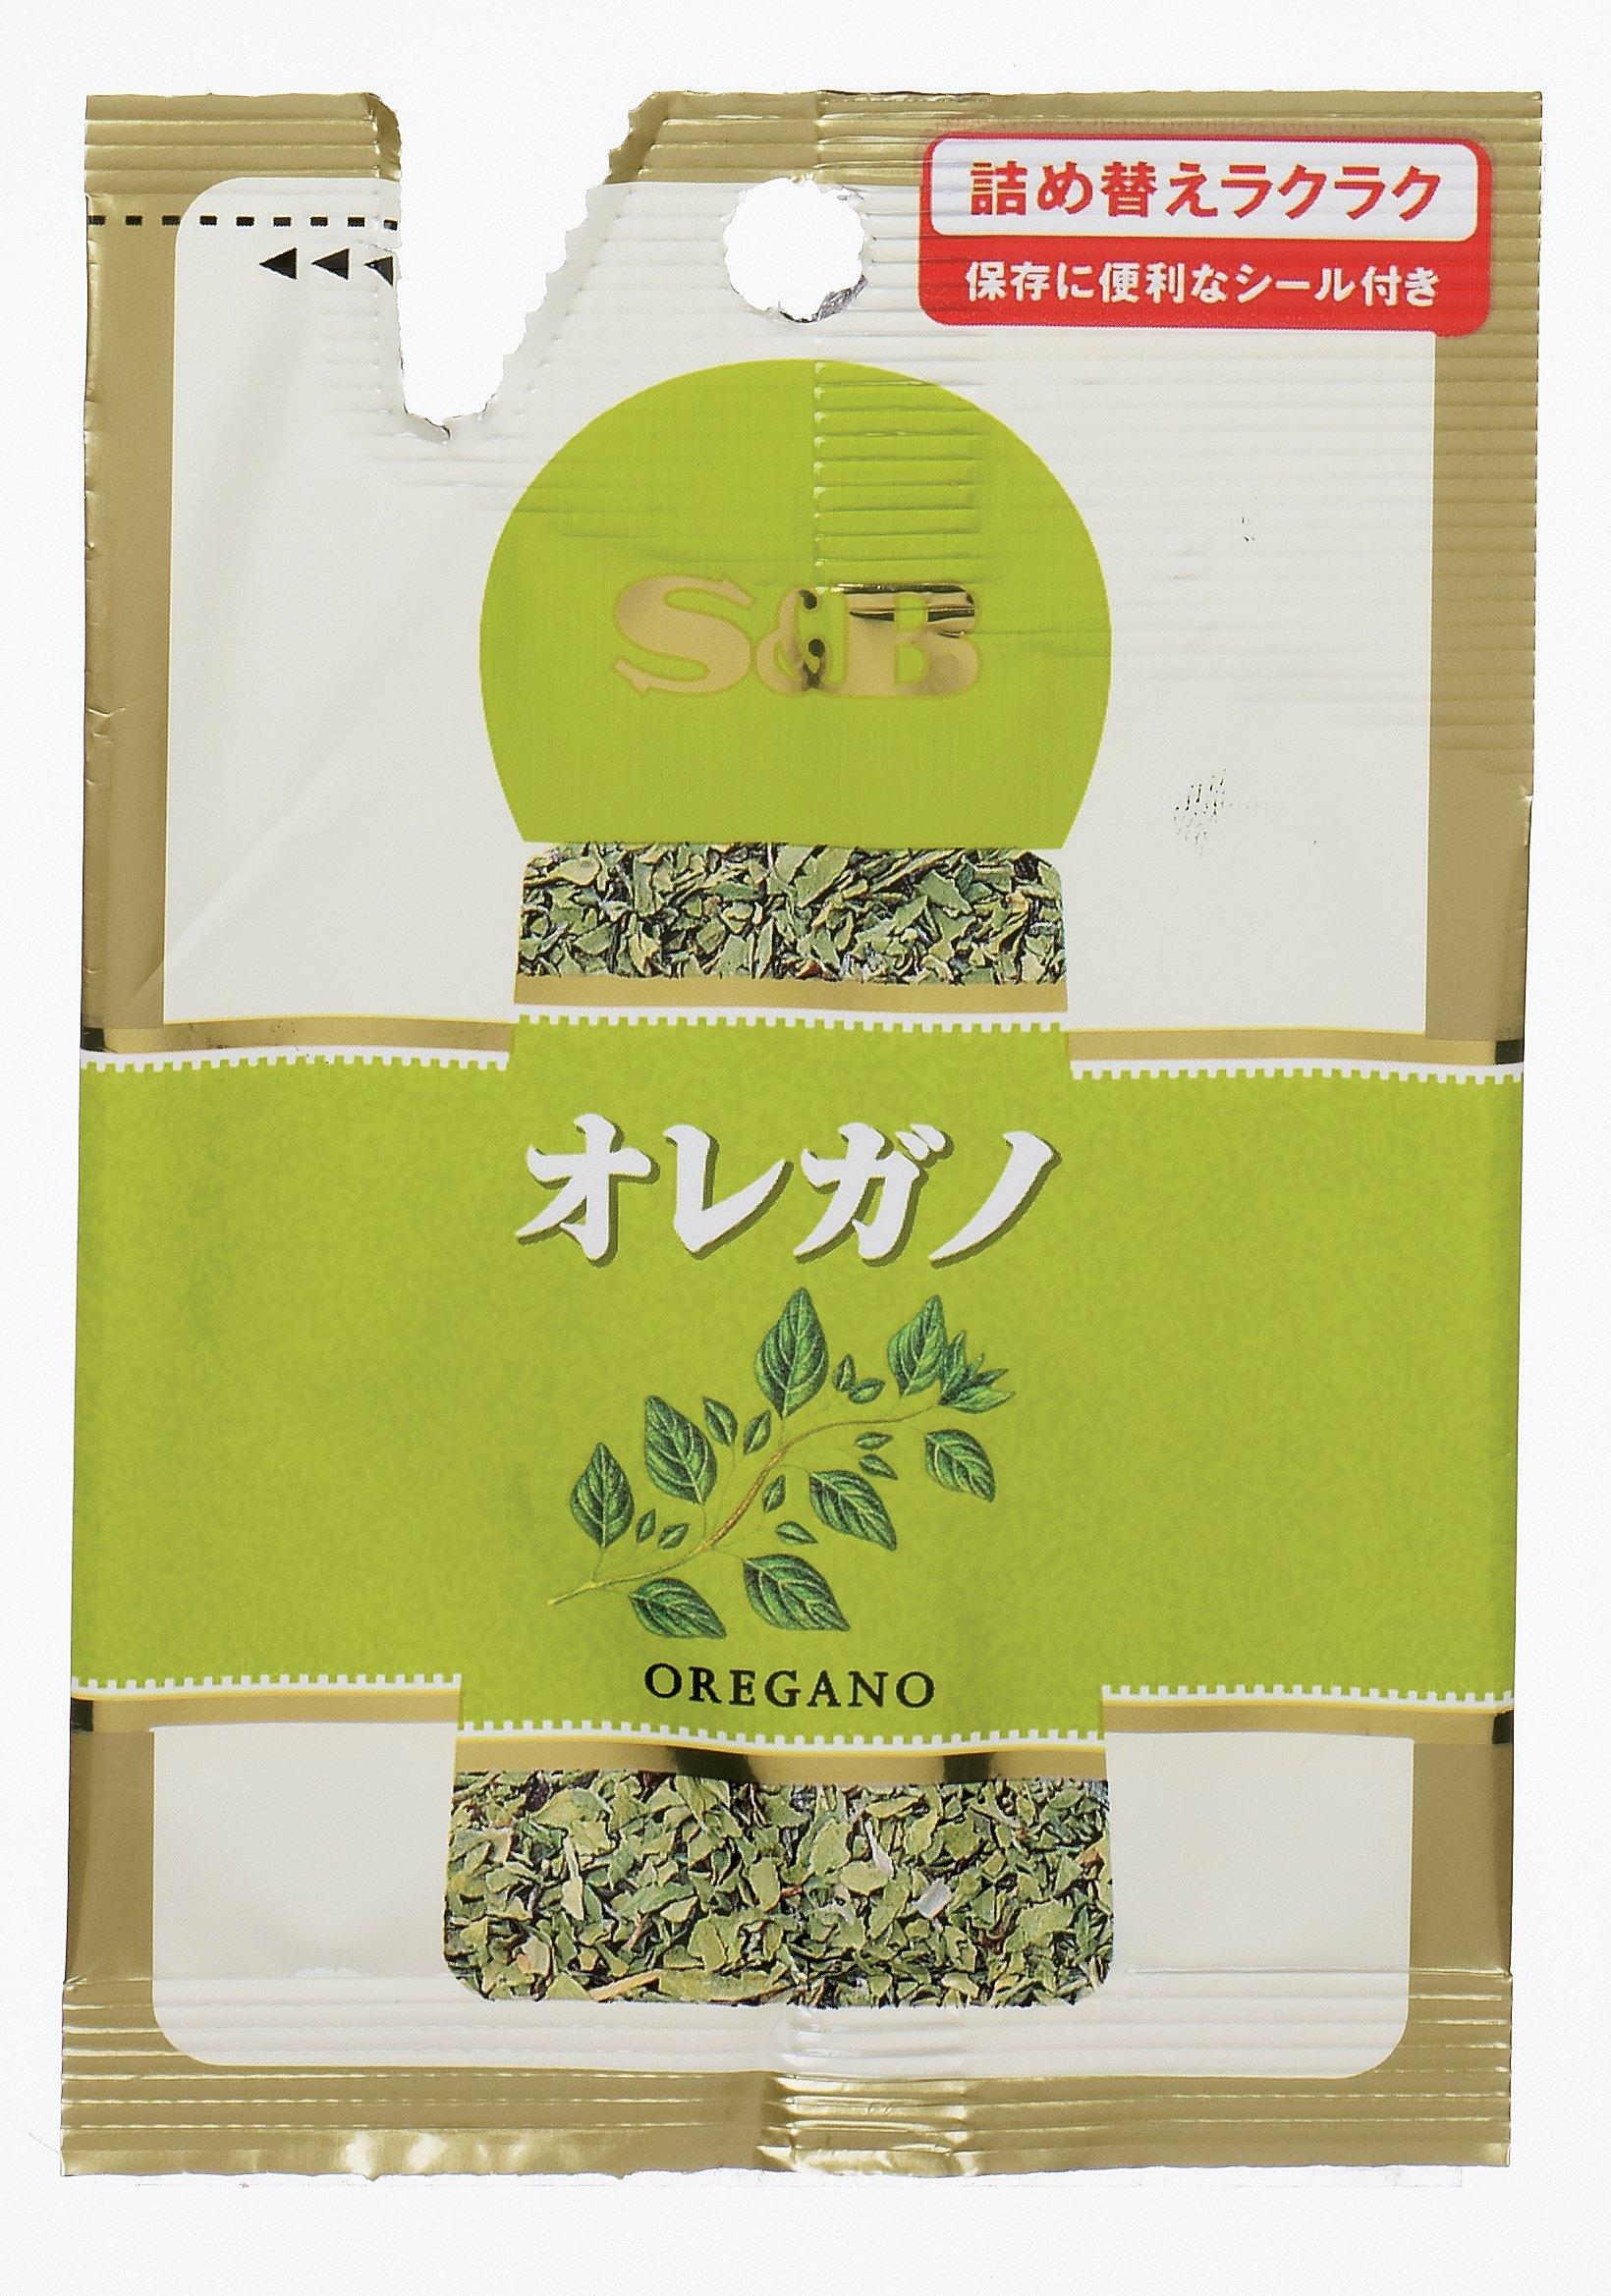 S & B bag containing oregano 2.5gX10 pieces